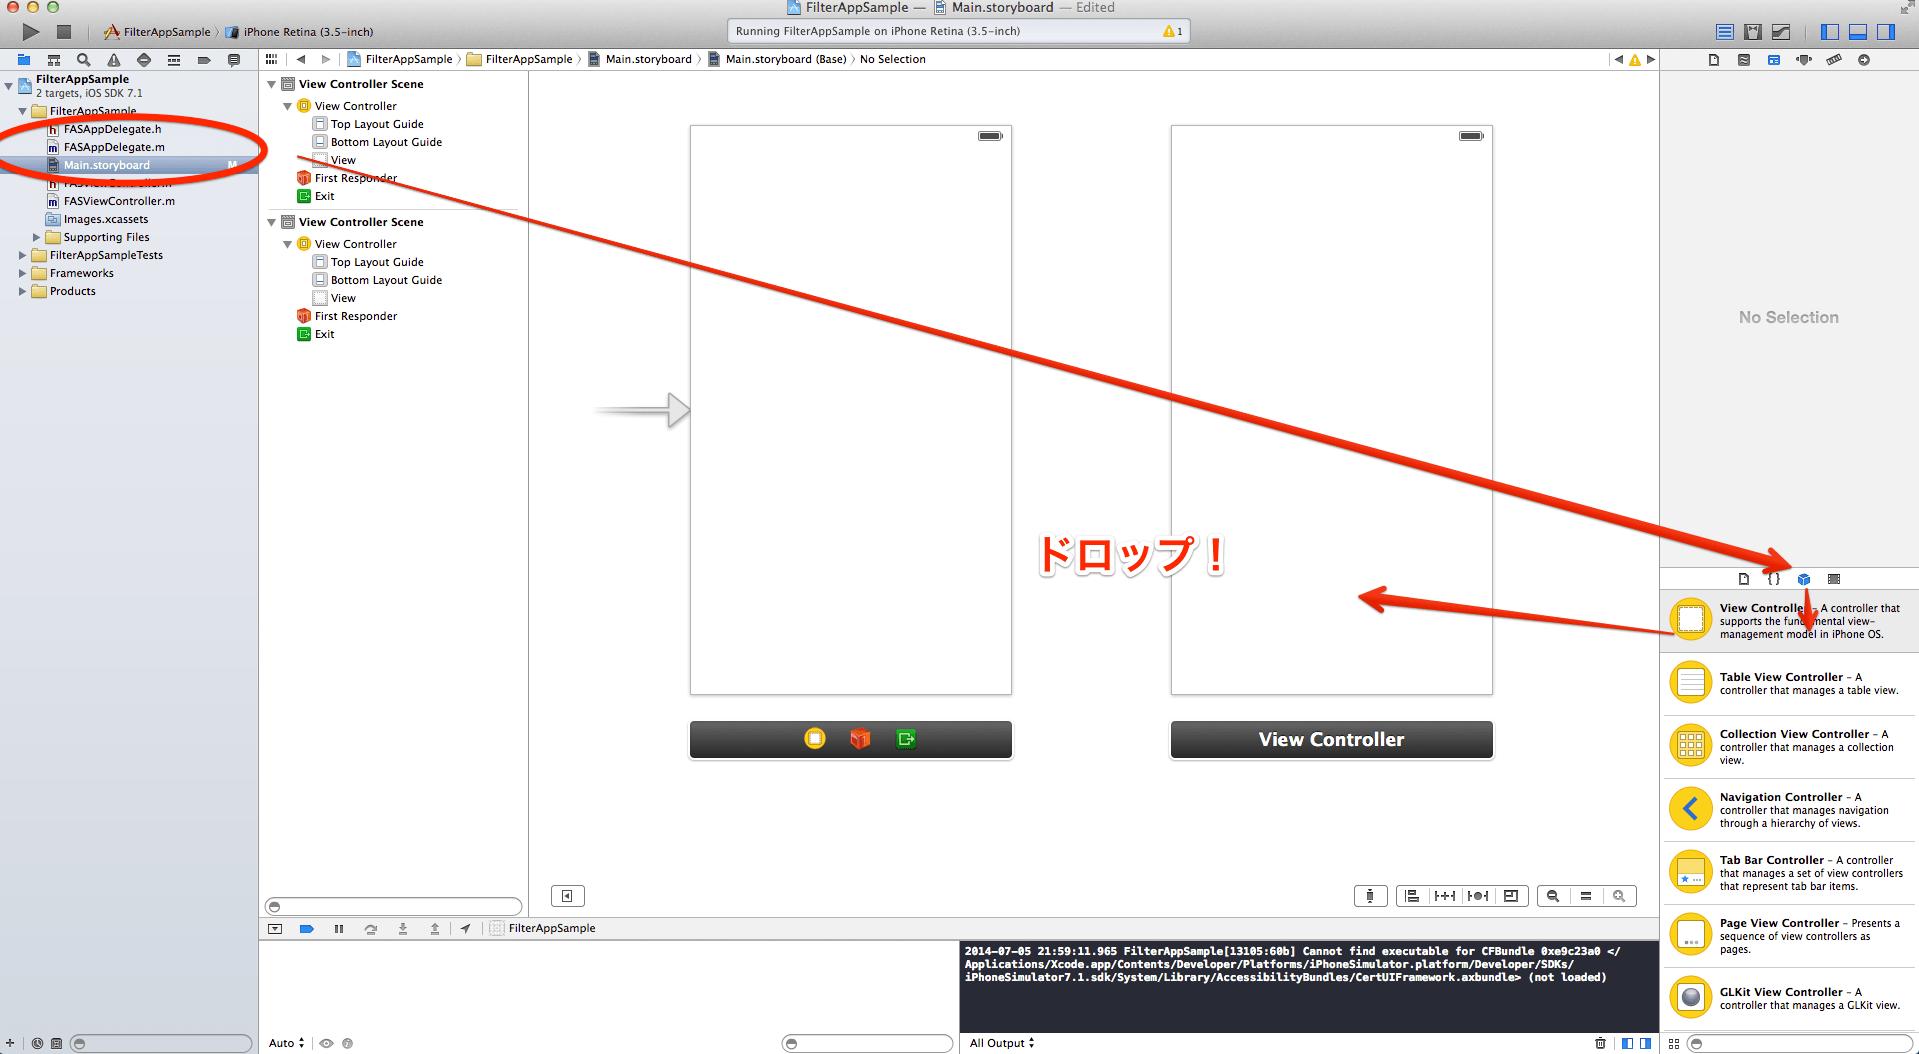 ViewControllerを追加